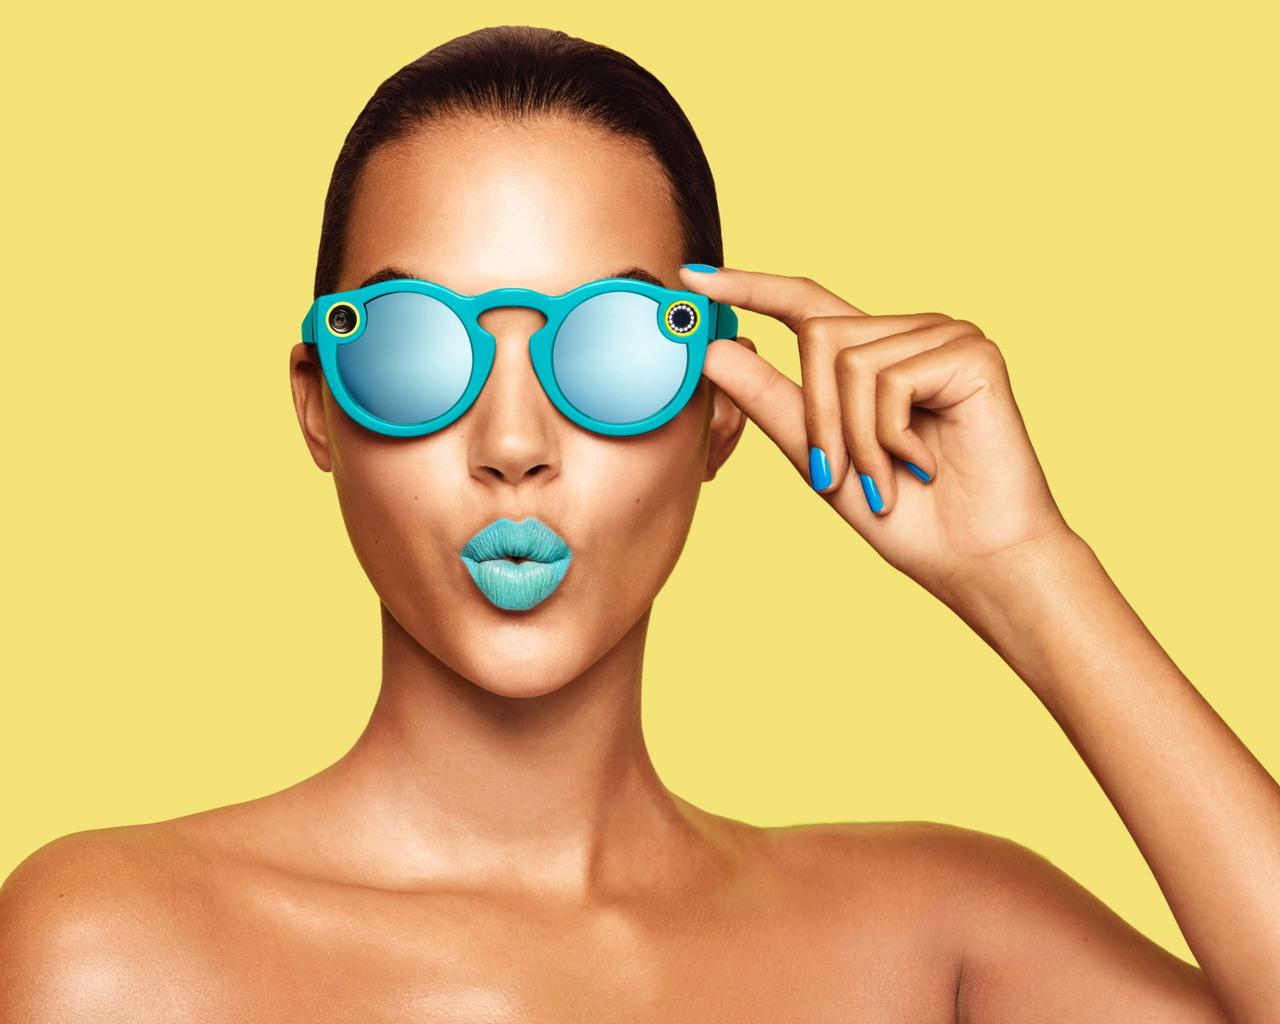 snapchat-glasses-image.jpg